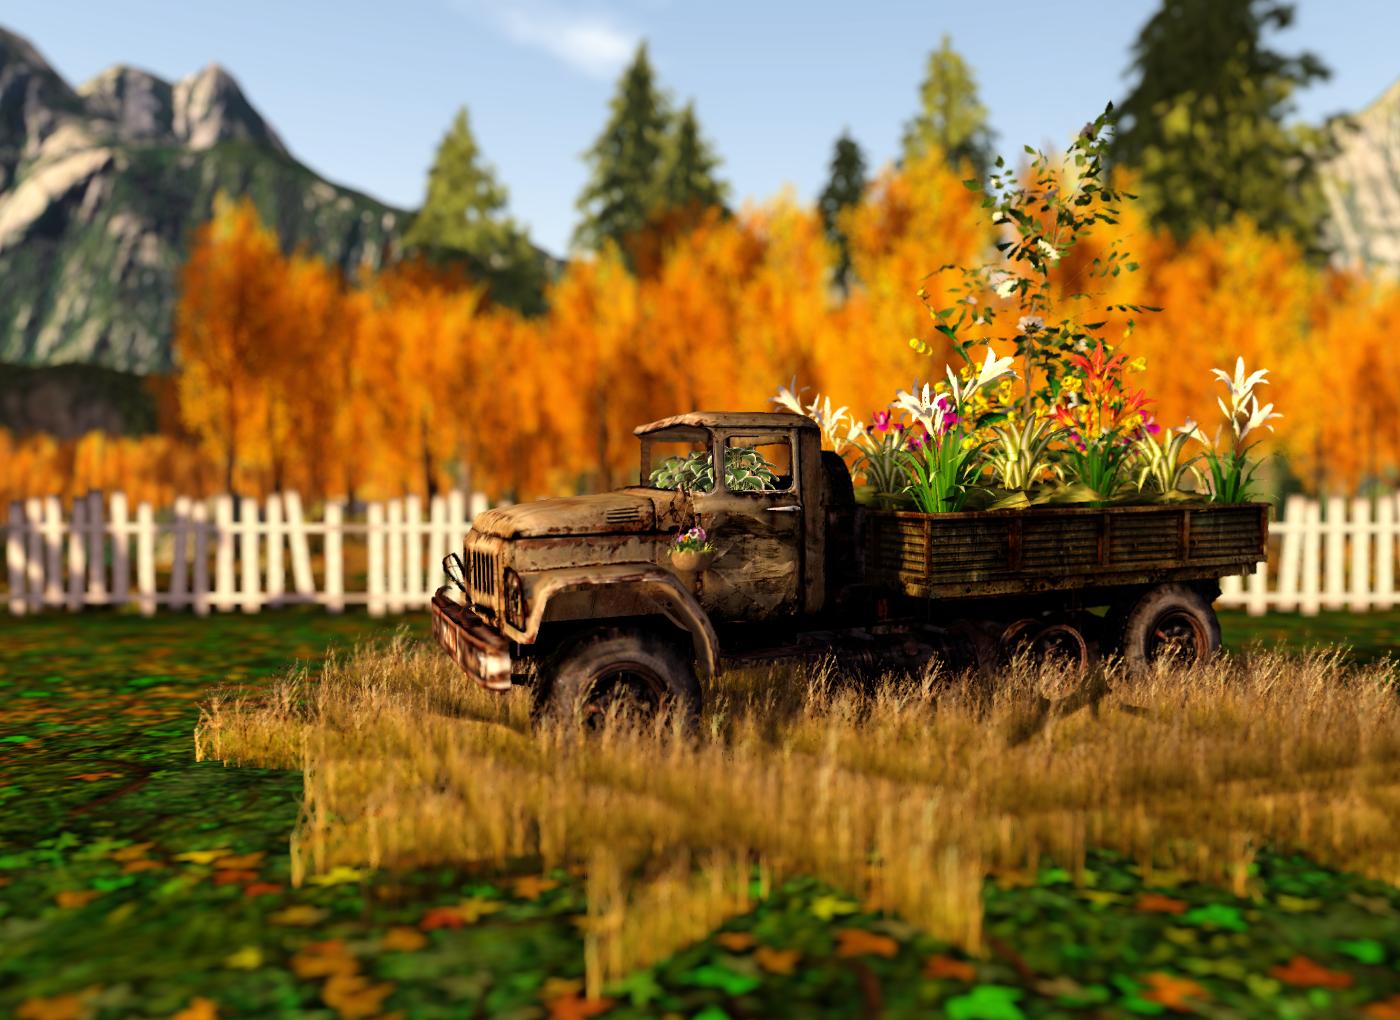 Randy's garden in the autumn